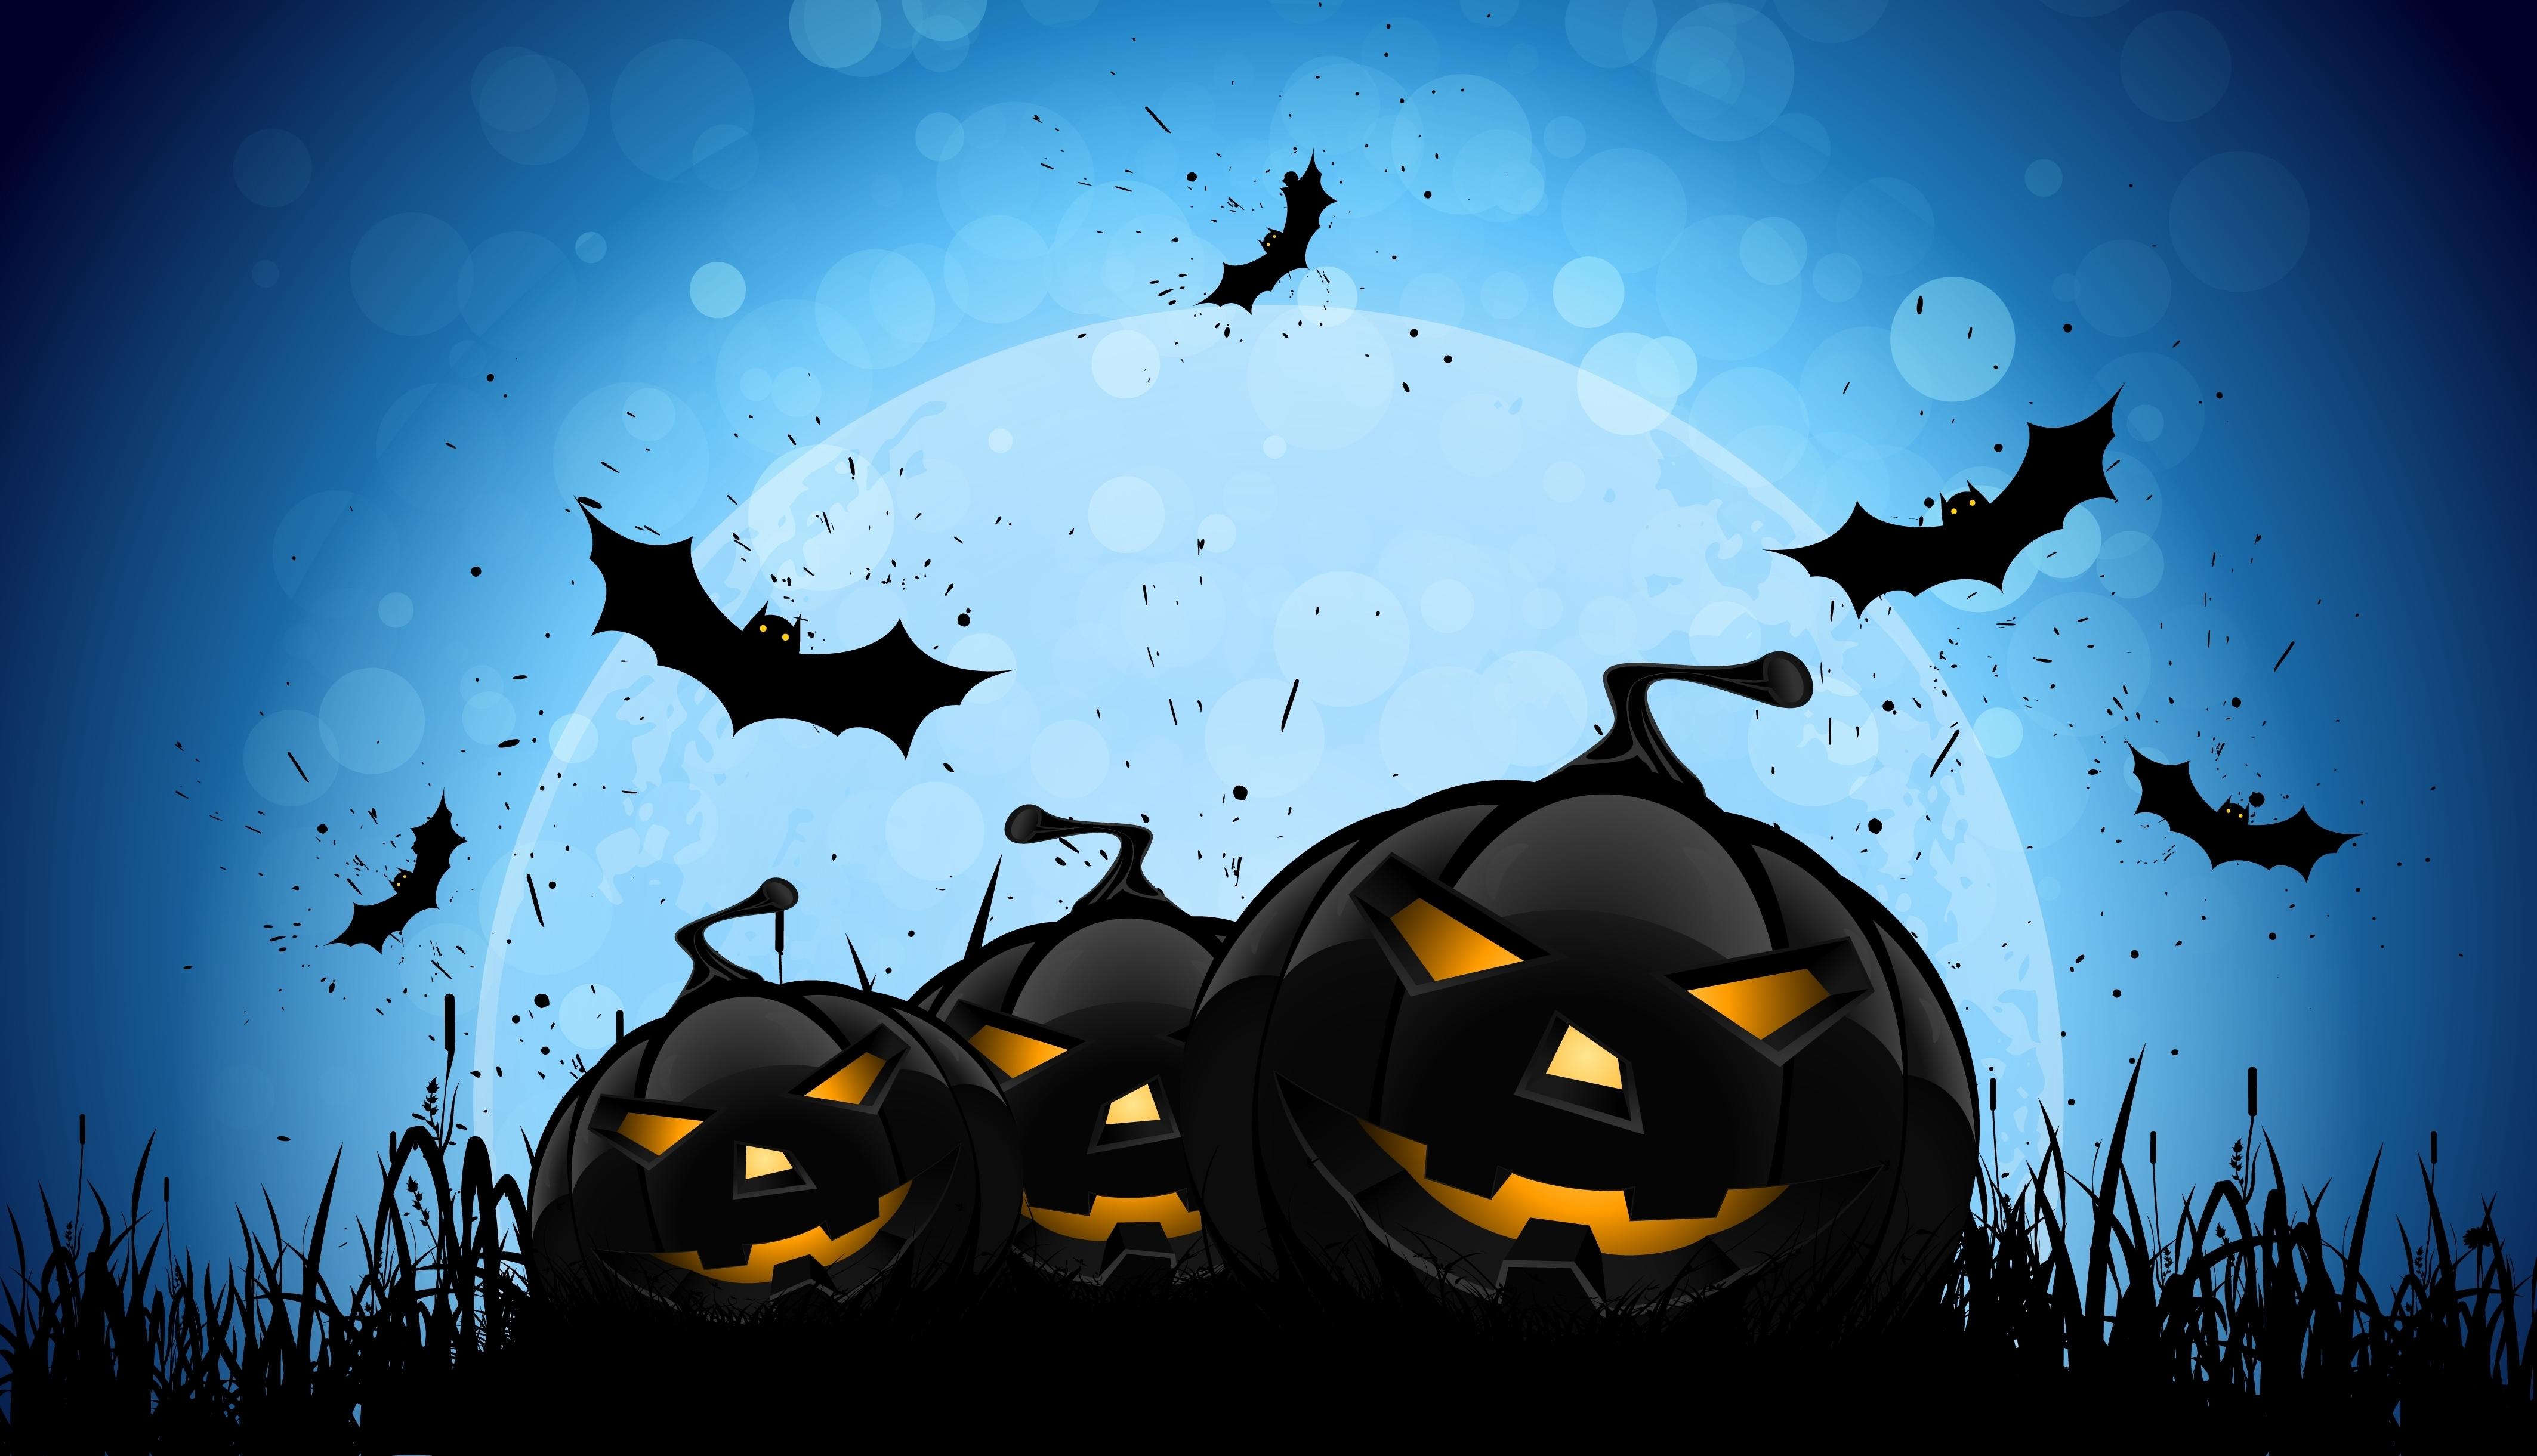 Halloween Bat 4k, HD Celebrations, 4k Wallpapers, Images ...